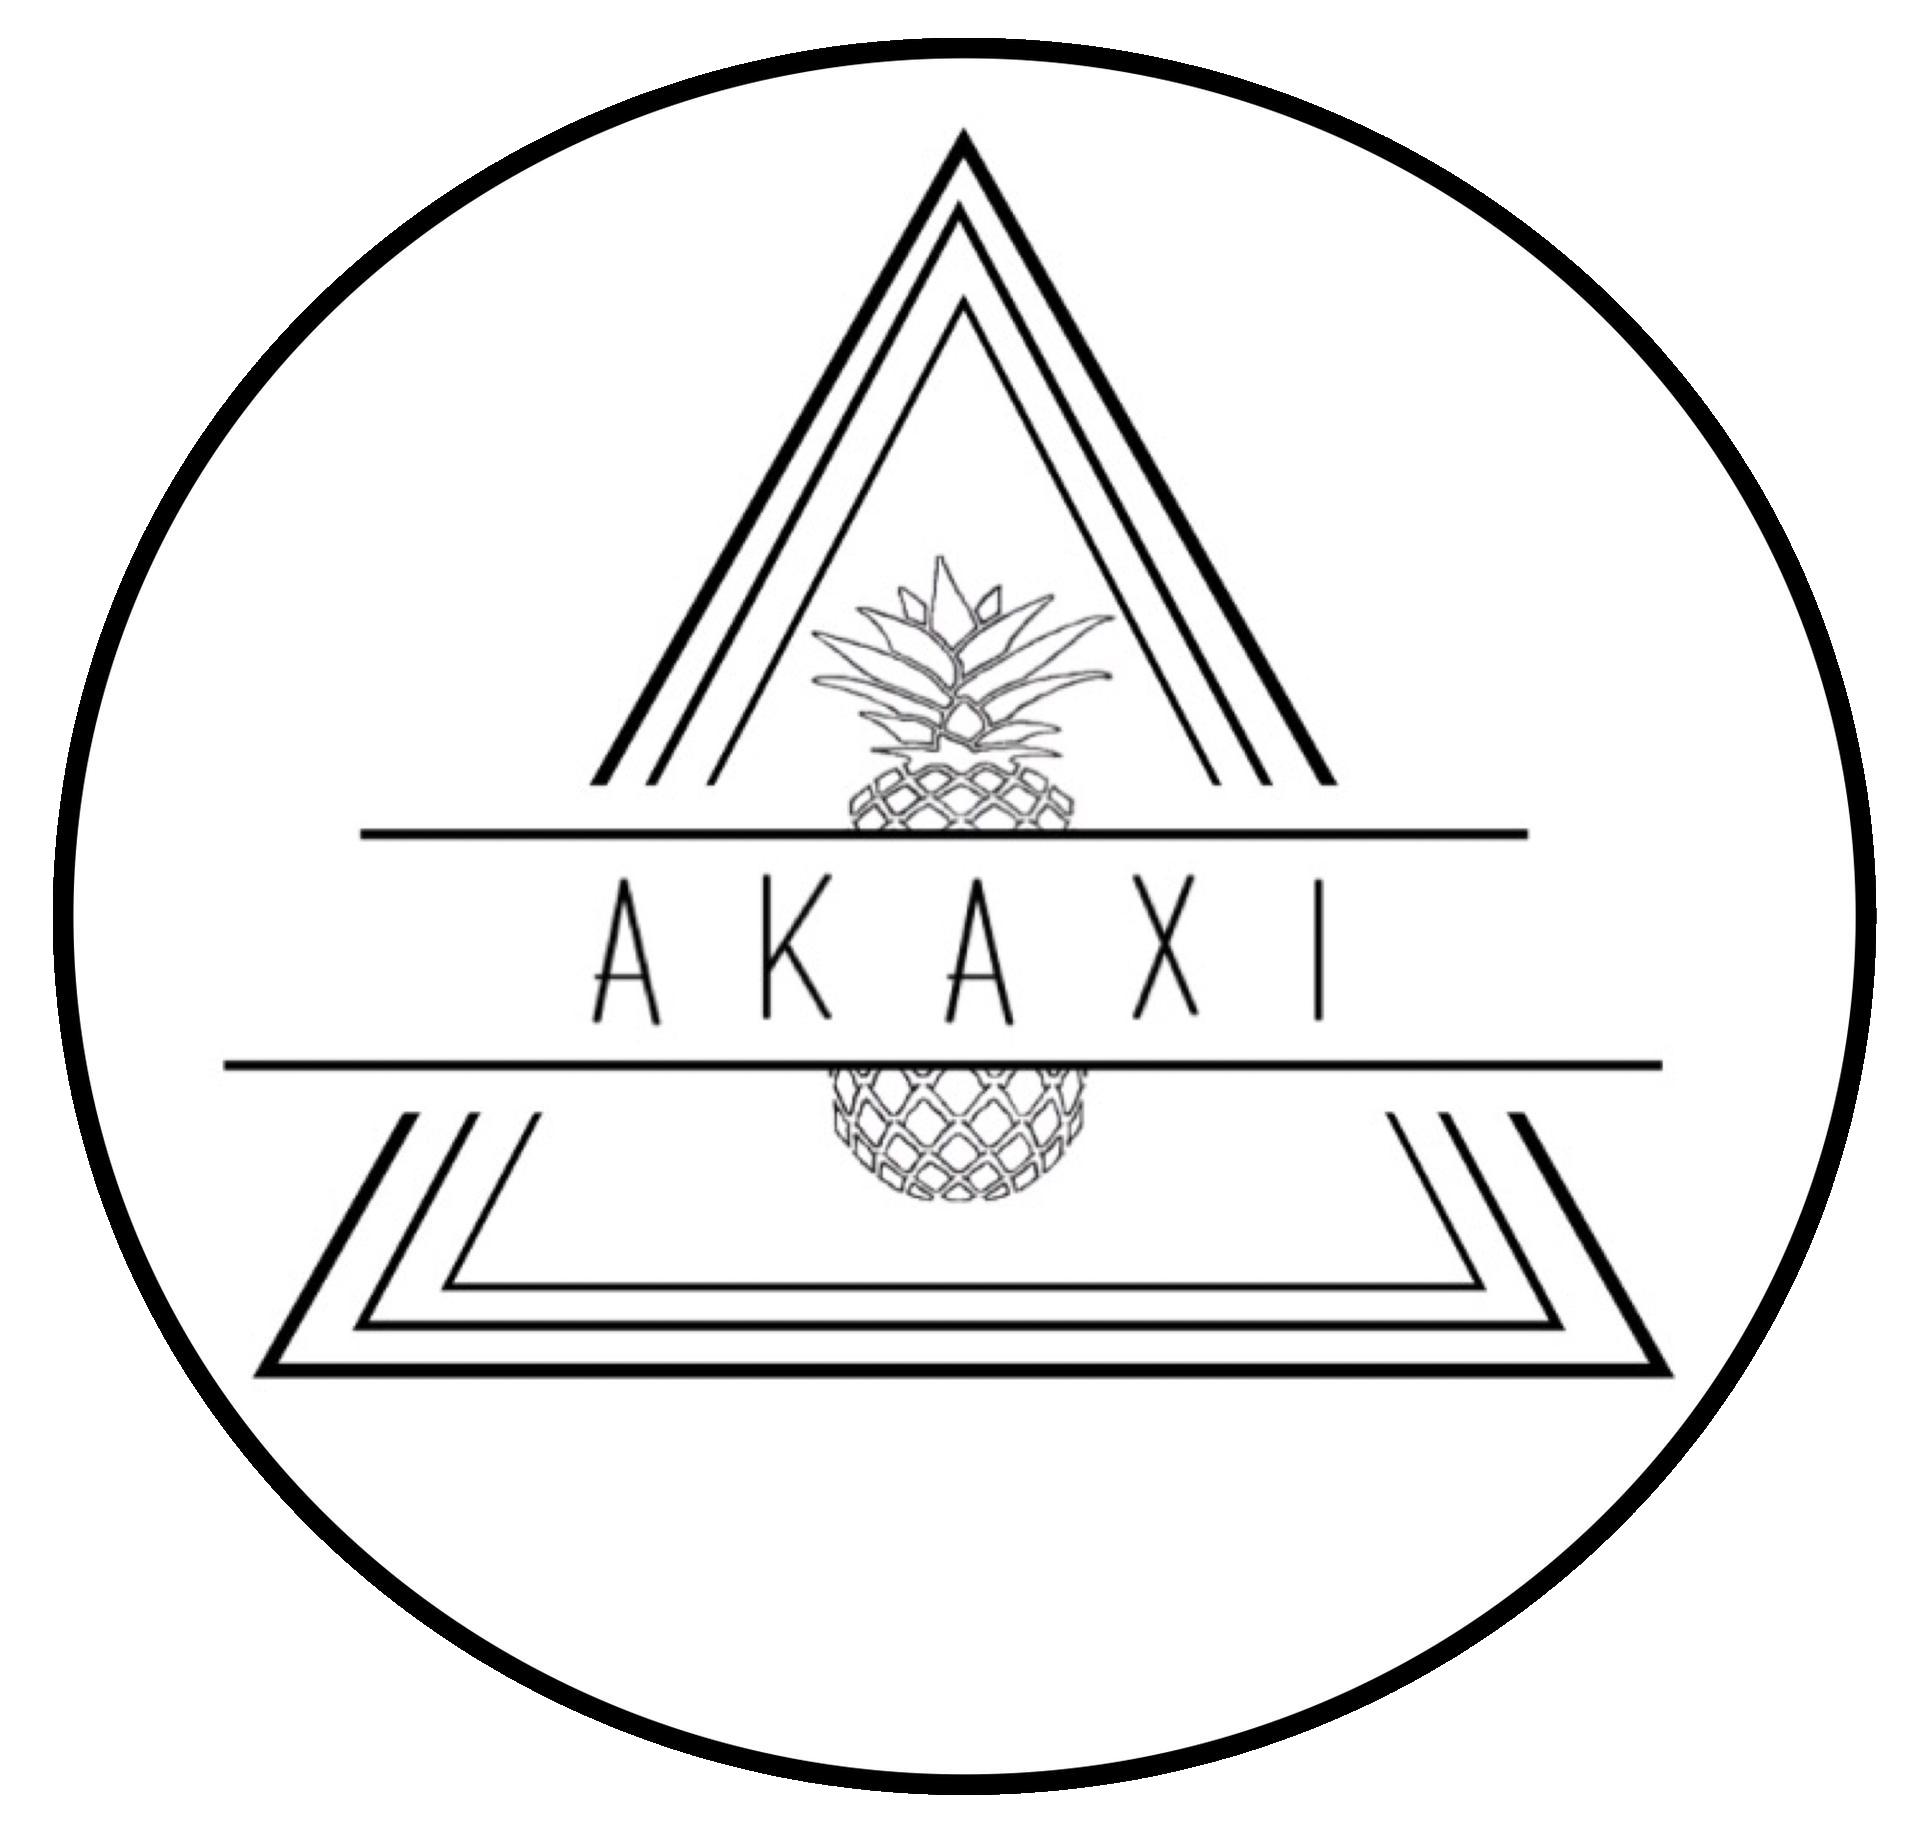 Akaxi